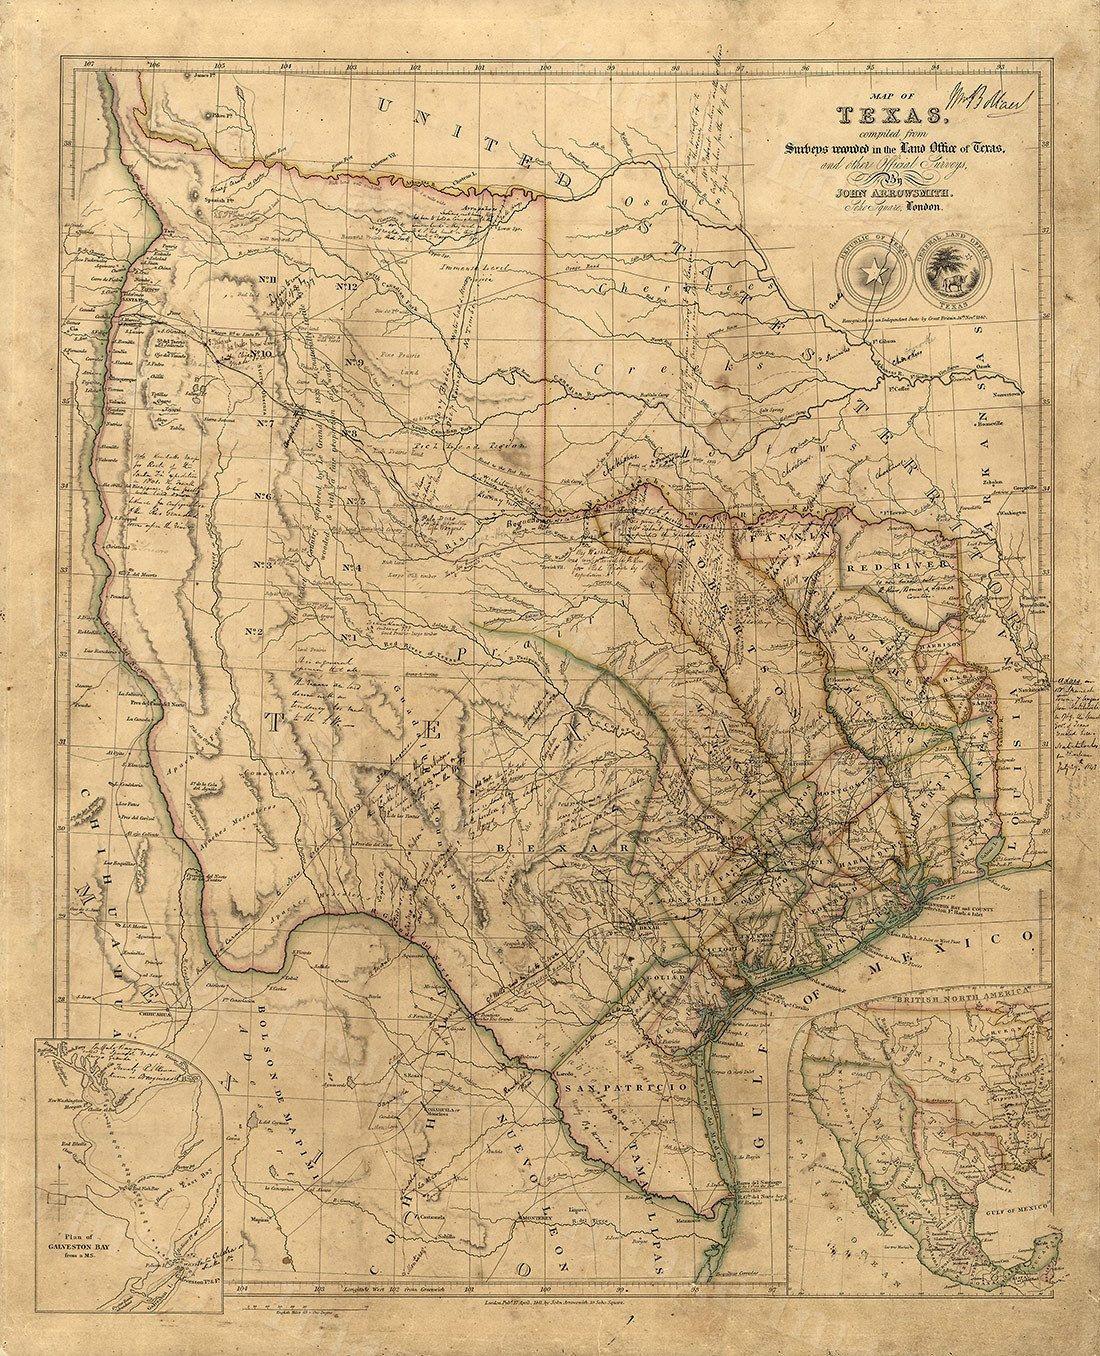 Old Texas Wall Map Vintage Historical Map Antique Restoration - Restoration hardware paris map